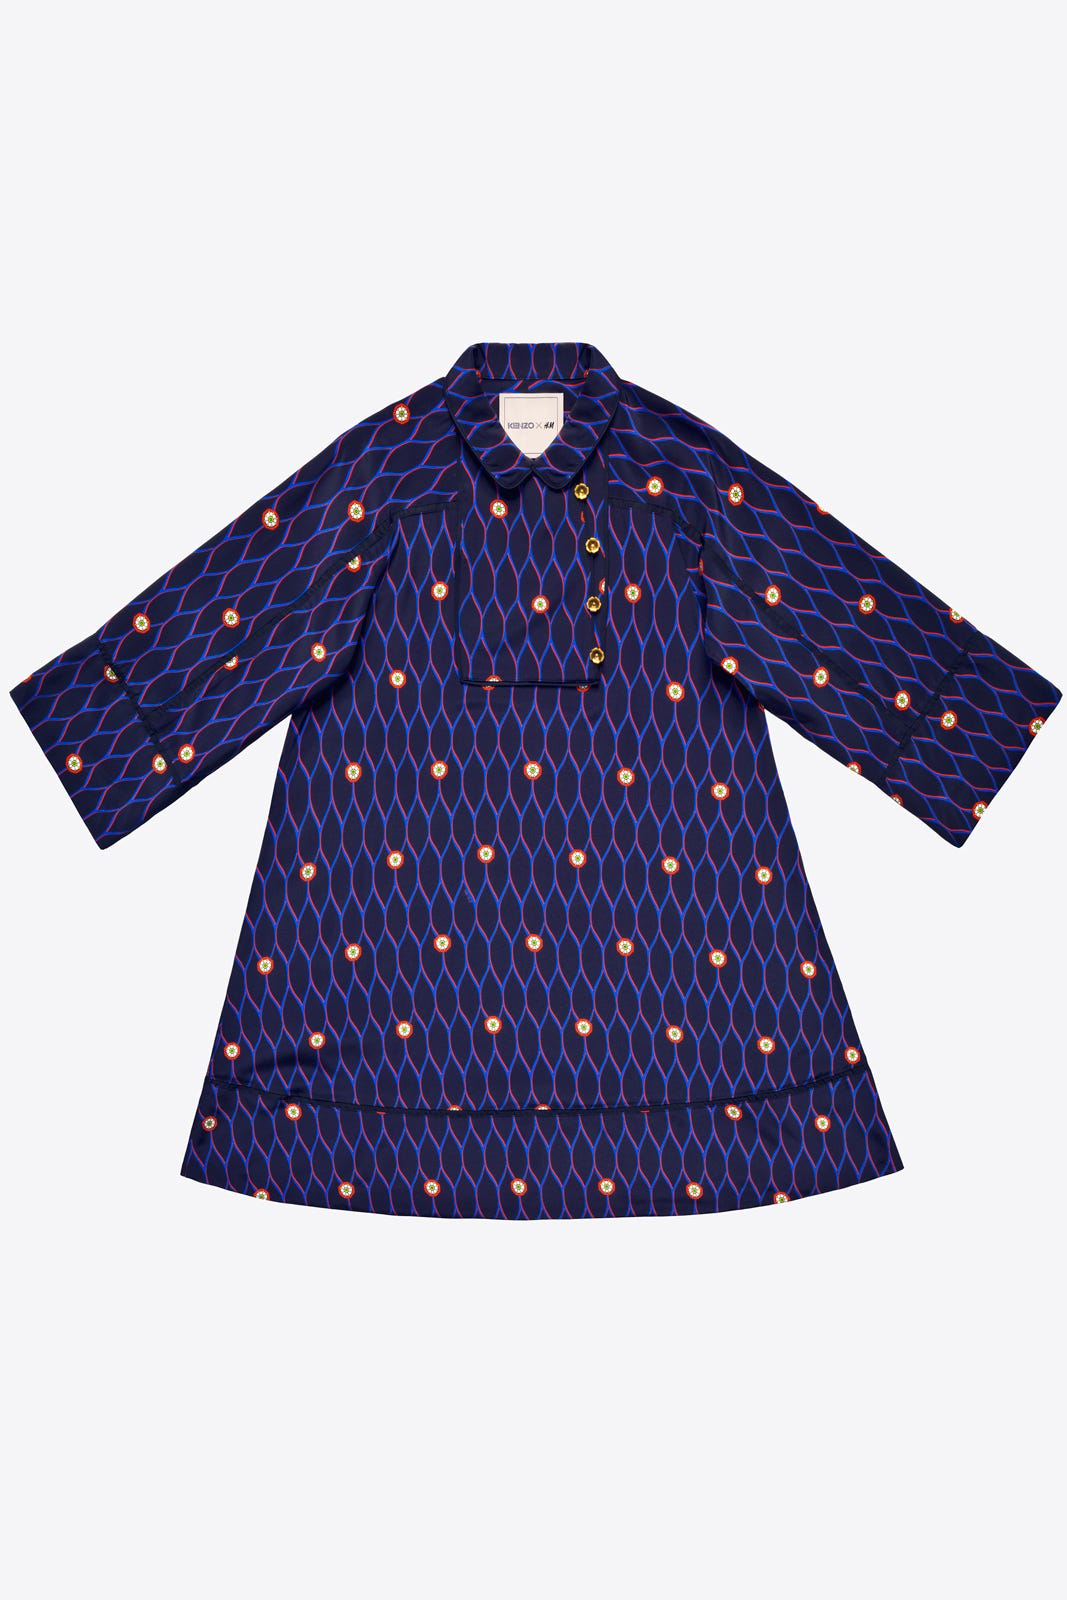 7f6da51d HM Kenzo Full Clothing Collaboration Photos